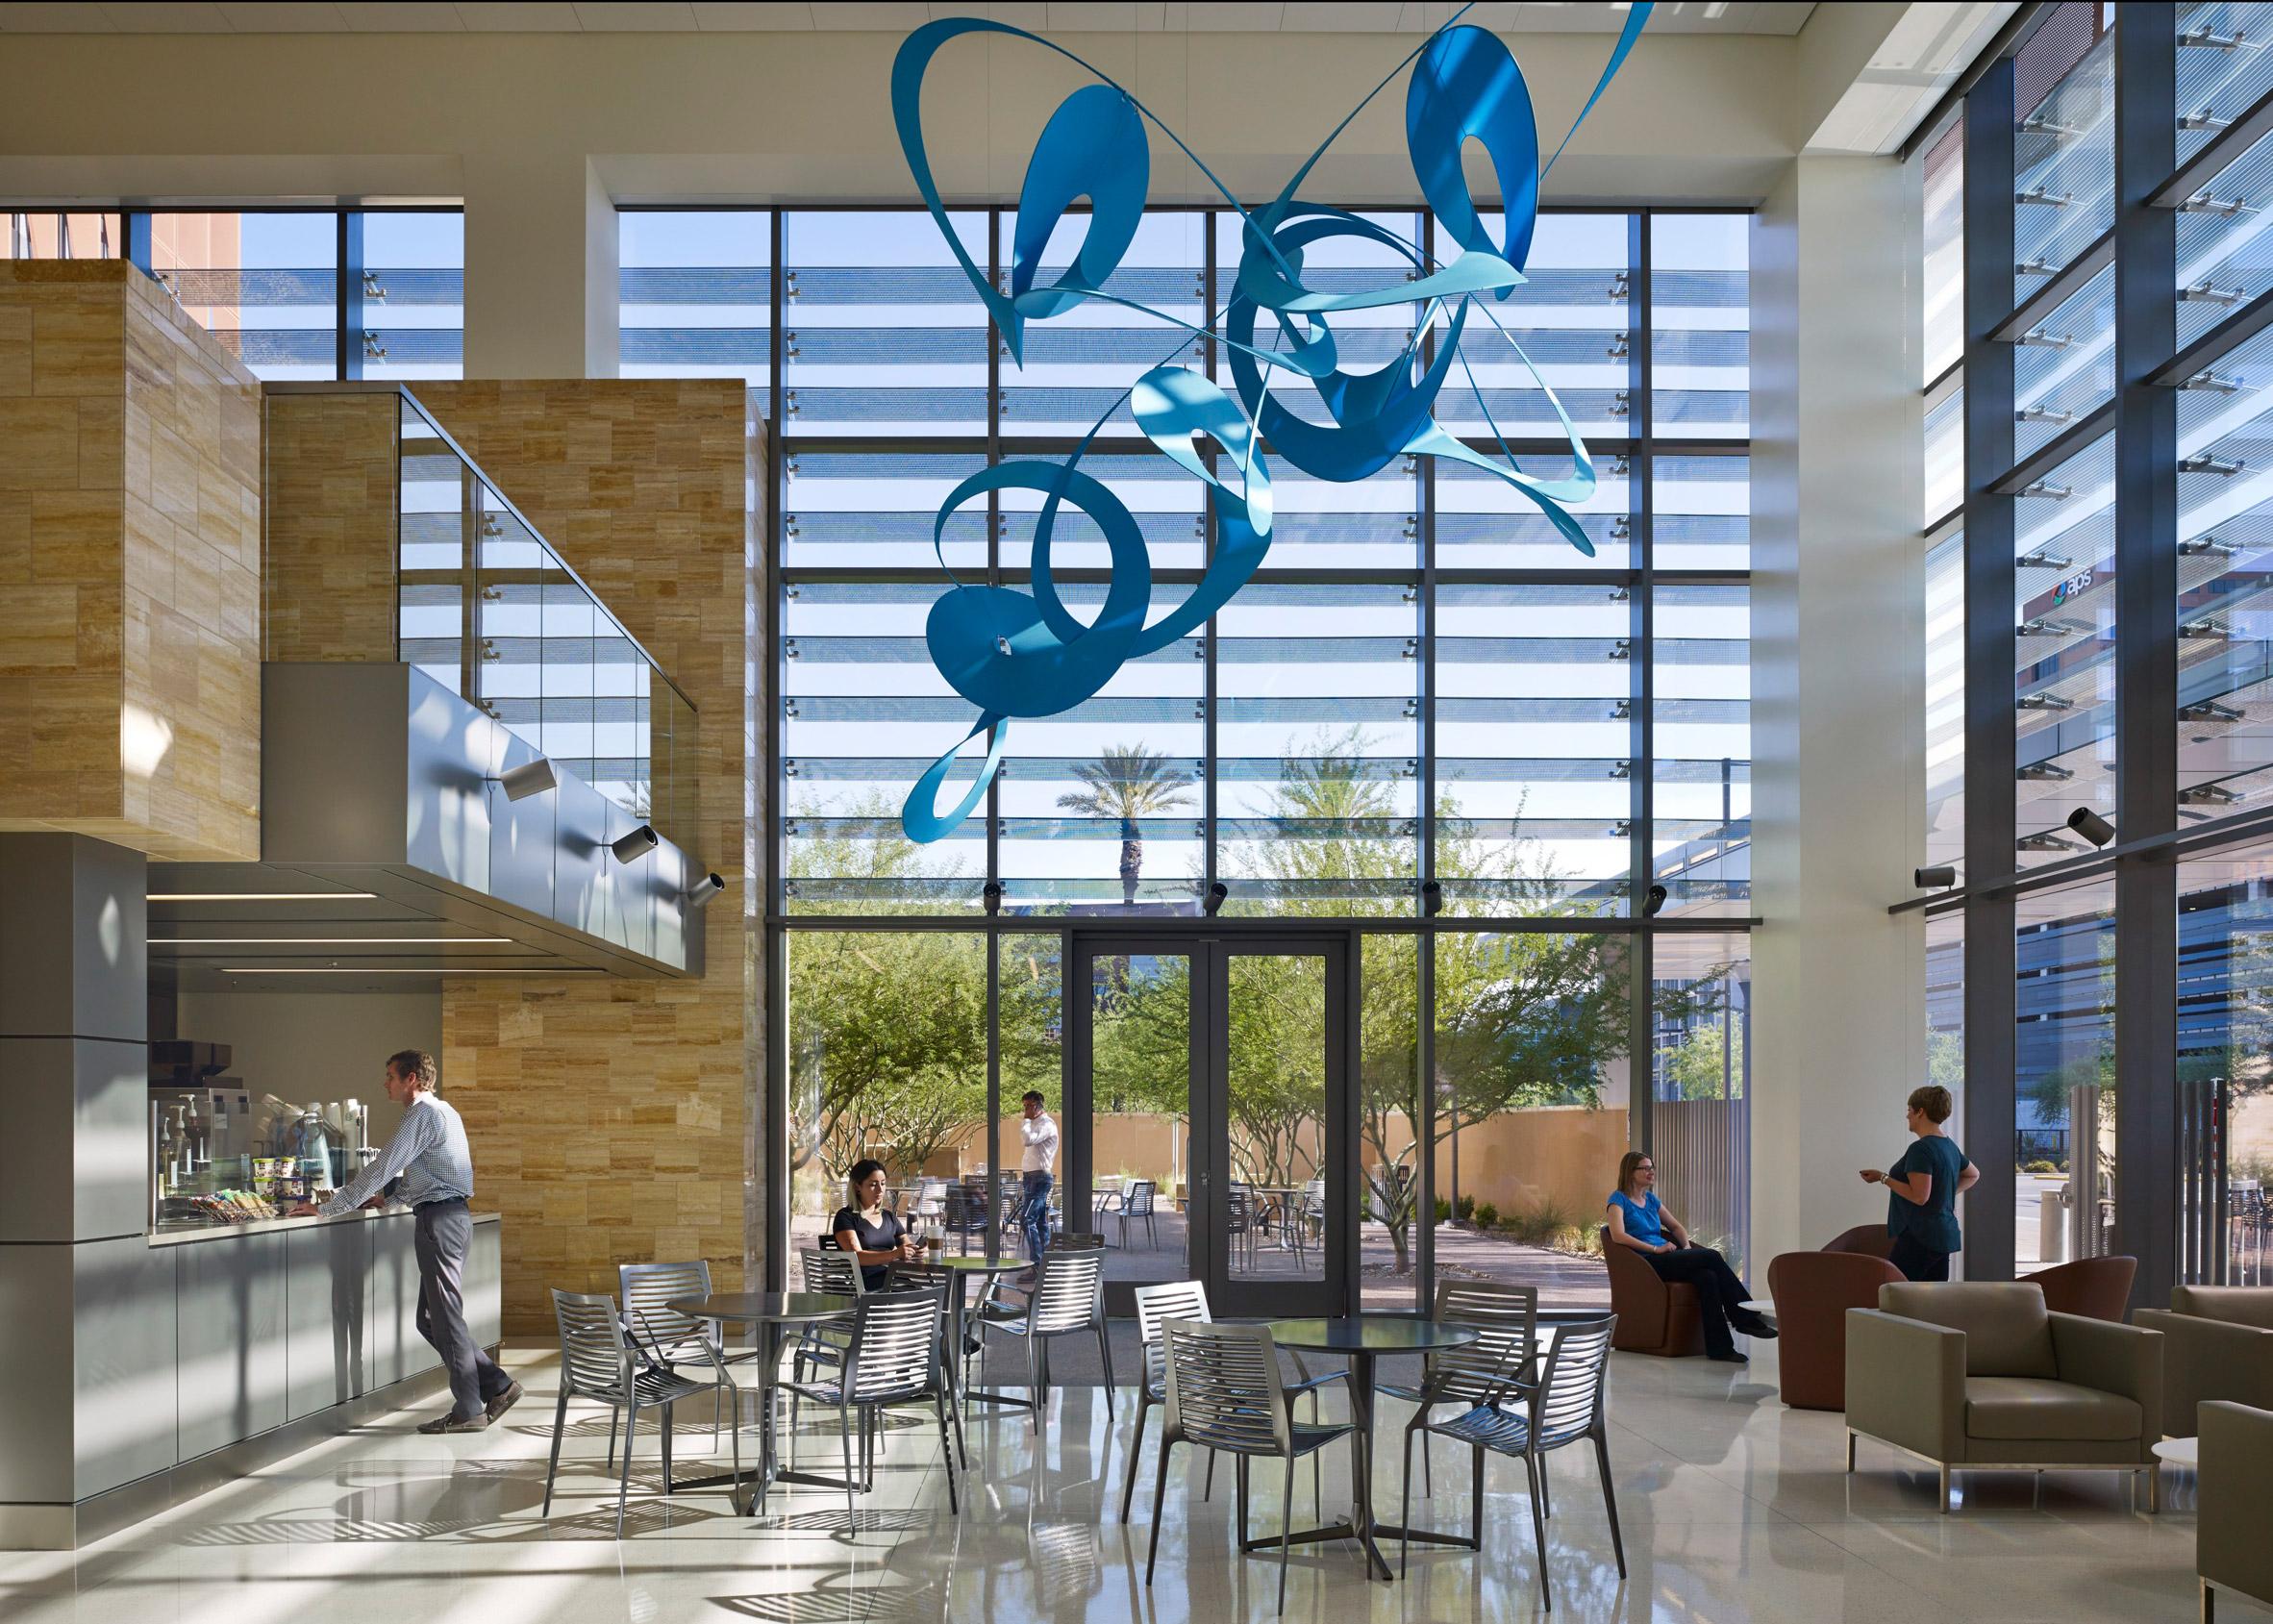 Univ. of Arizona cancer center by ZGF